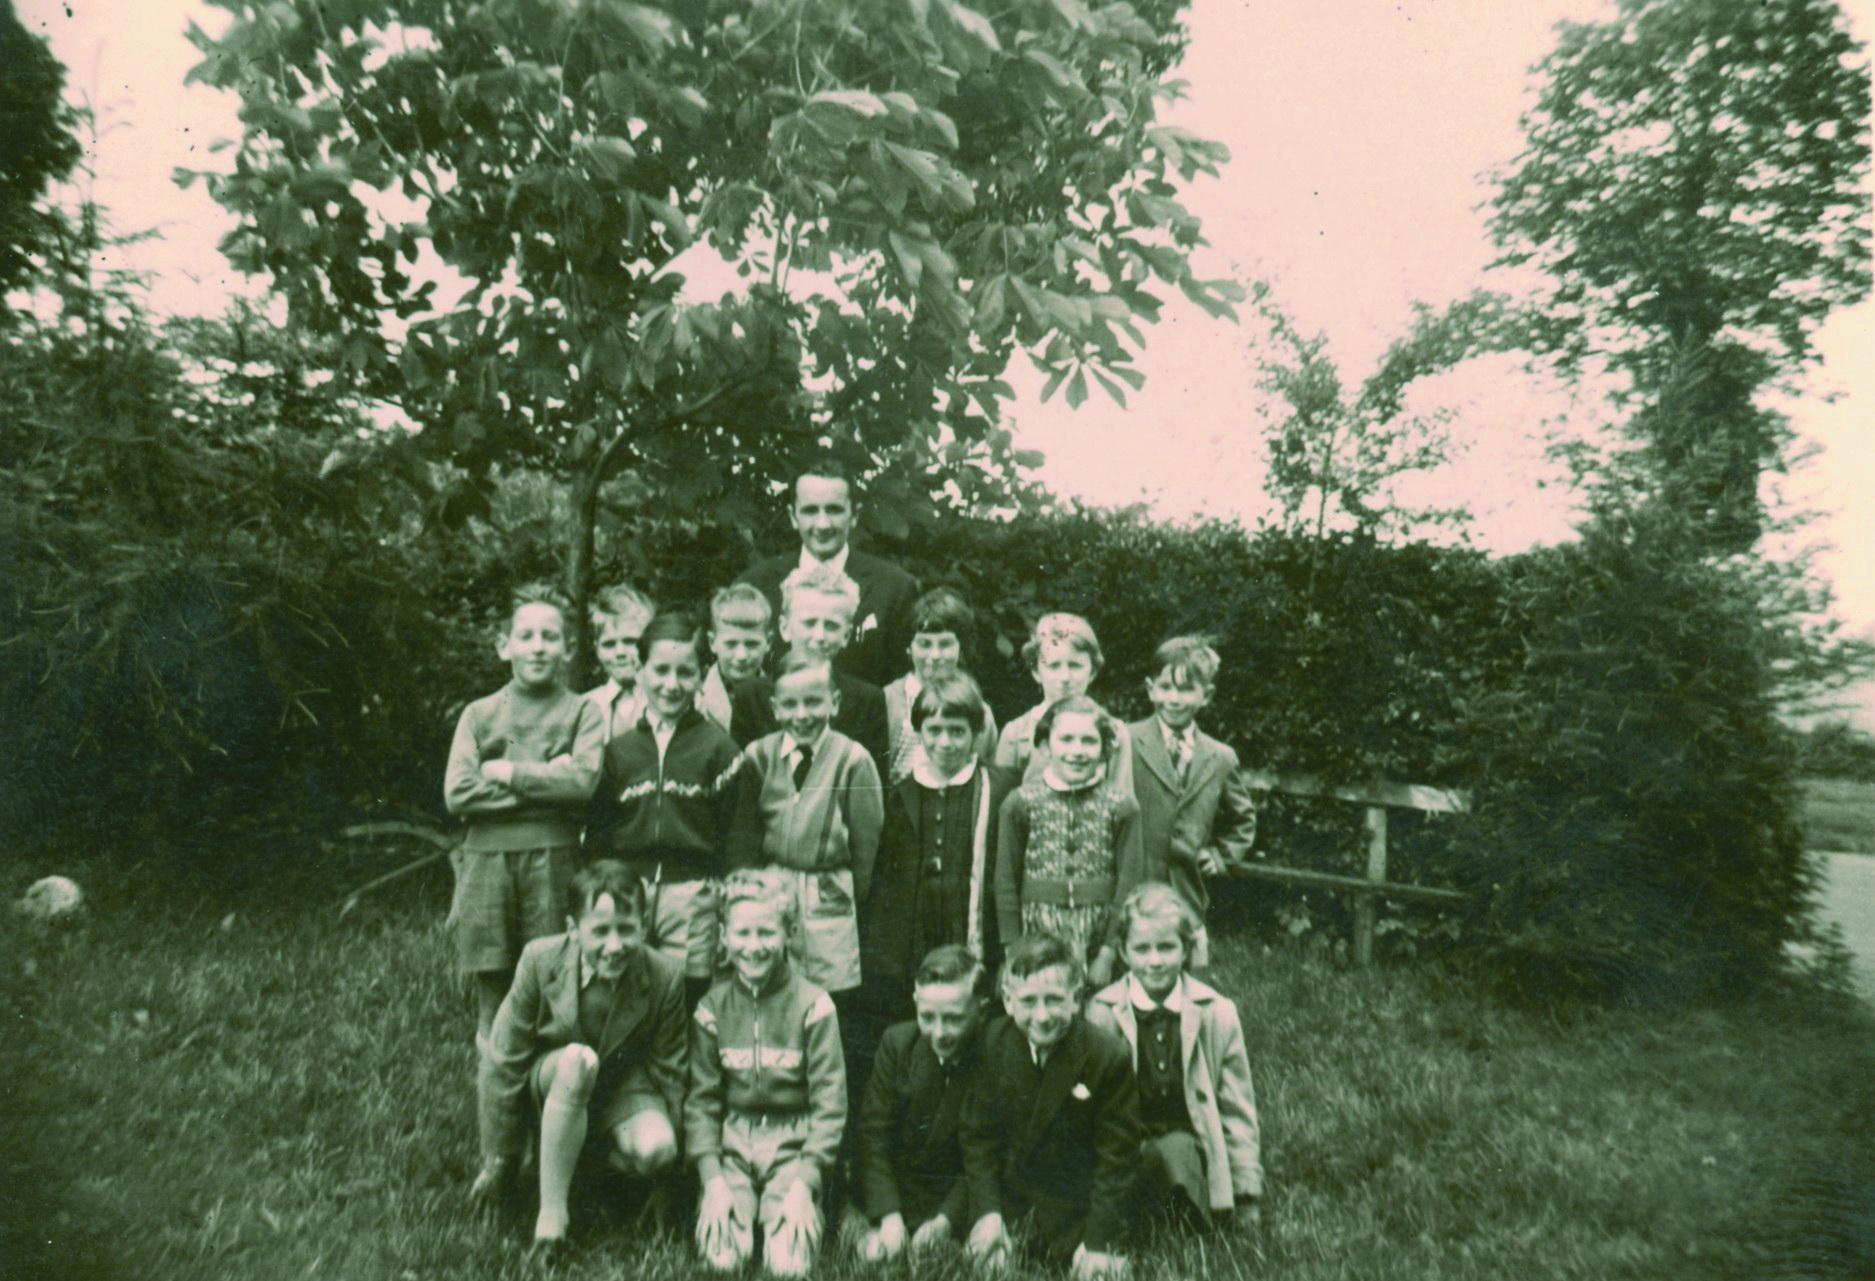 Bei Lehrer Haag in Büllingen 1956